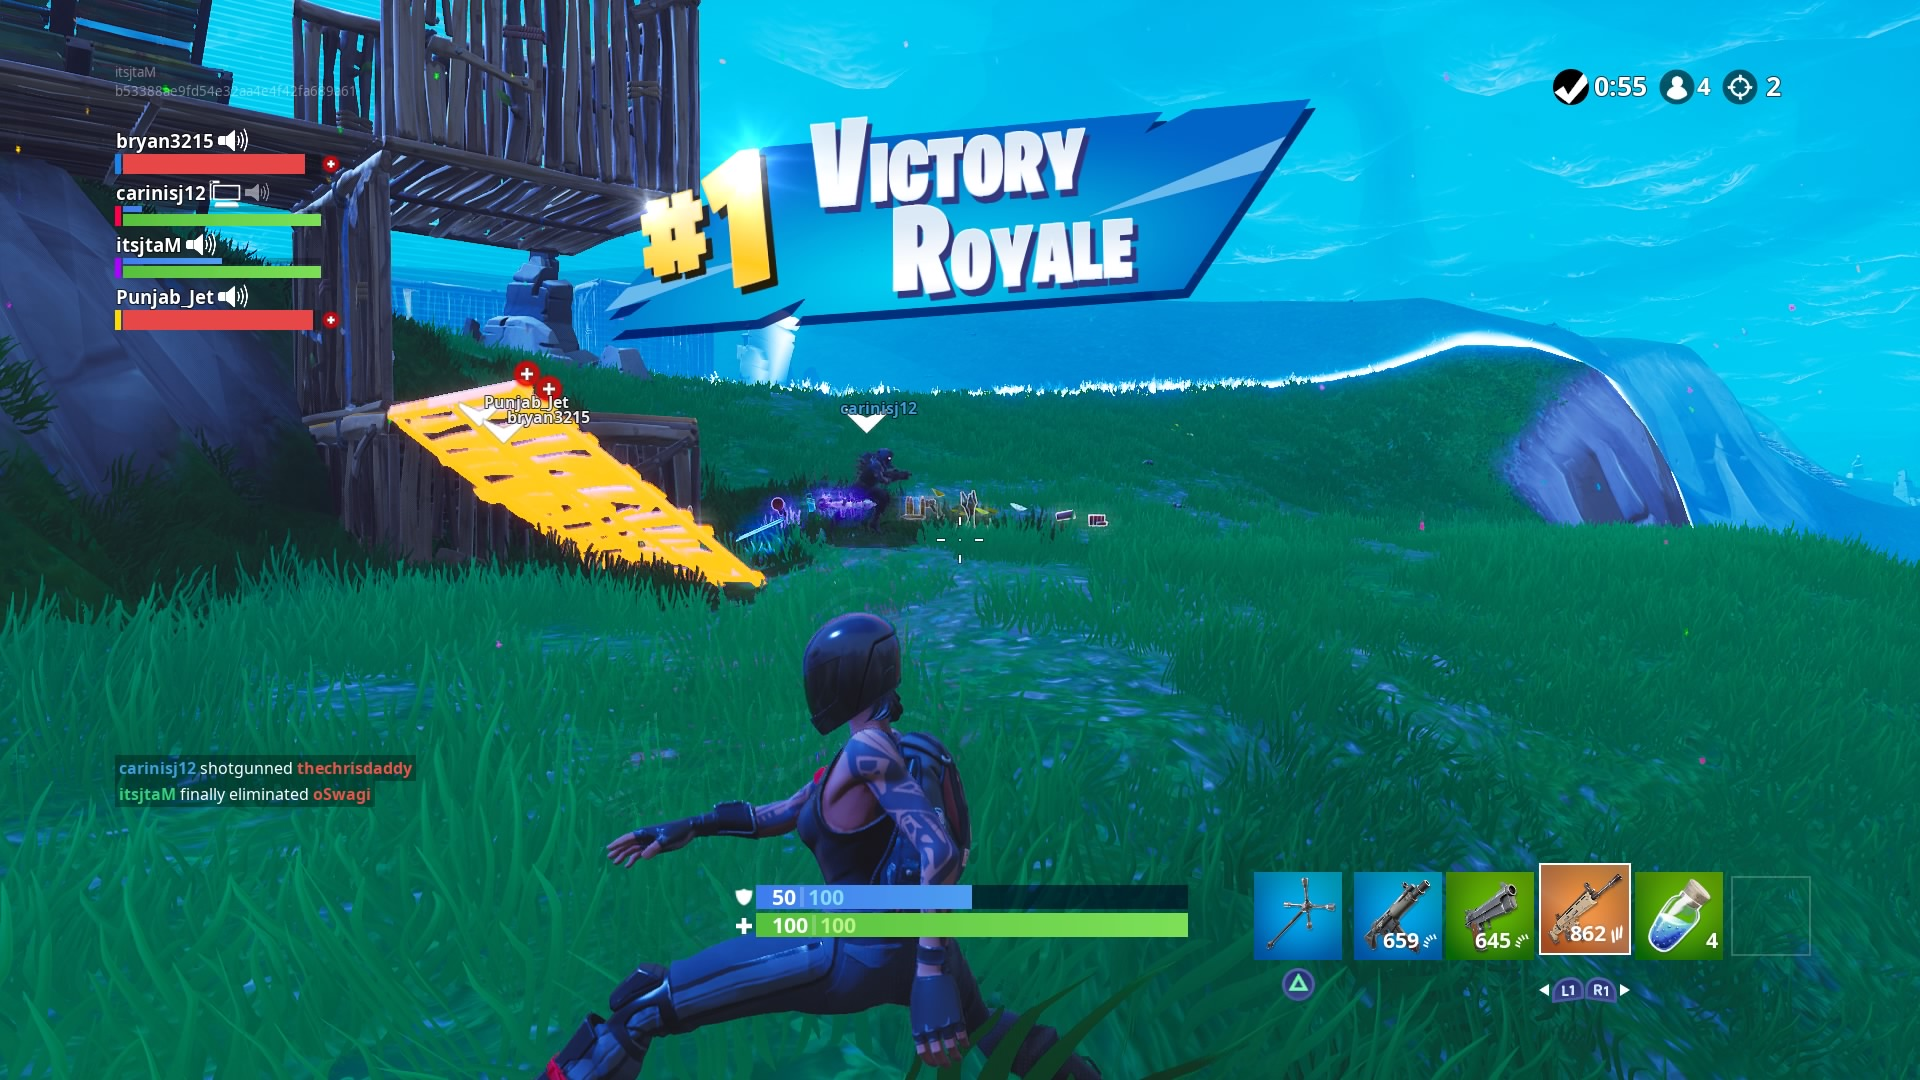 fortnite victory hd wallpaper 65386